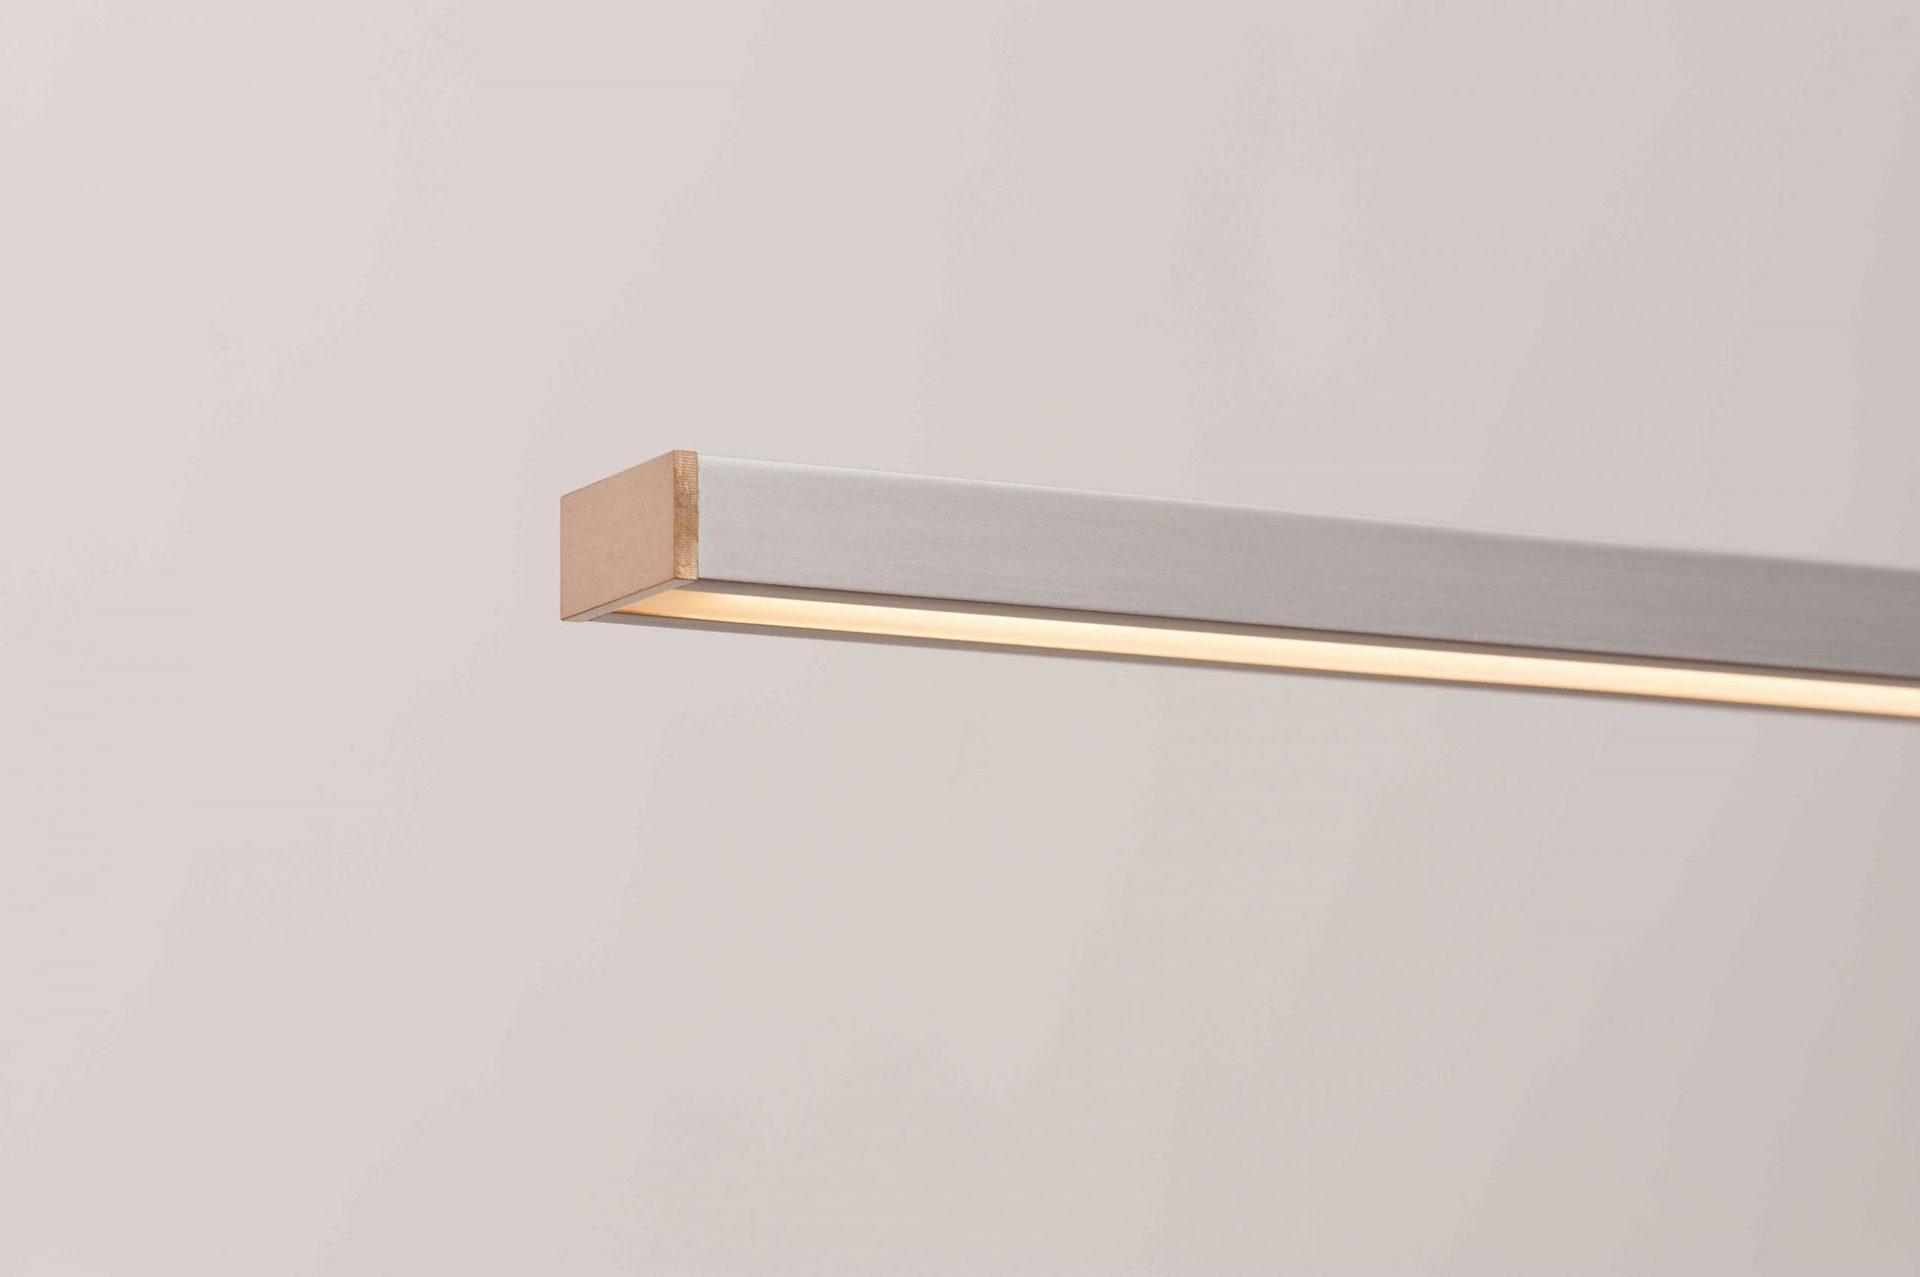 S.O.L. Sea Of Light FERROLIGHT Design 3   Hoogebeen Interieur